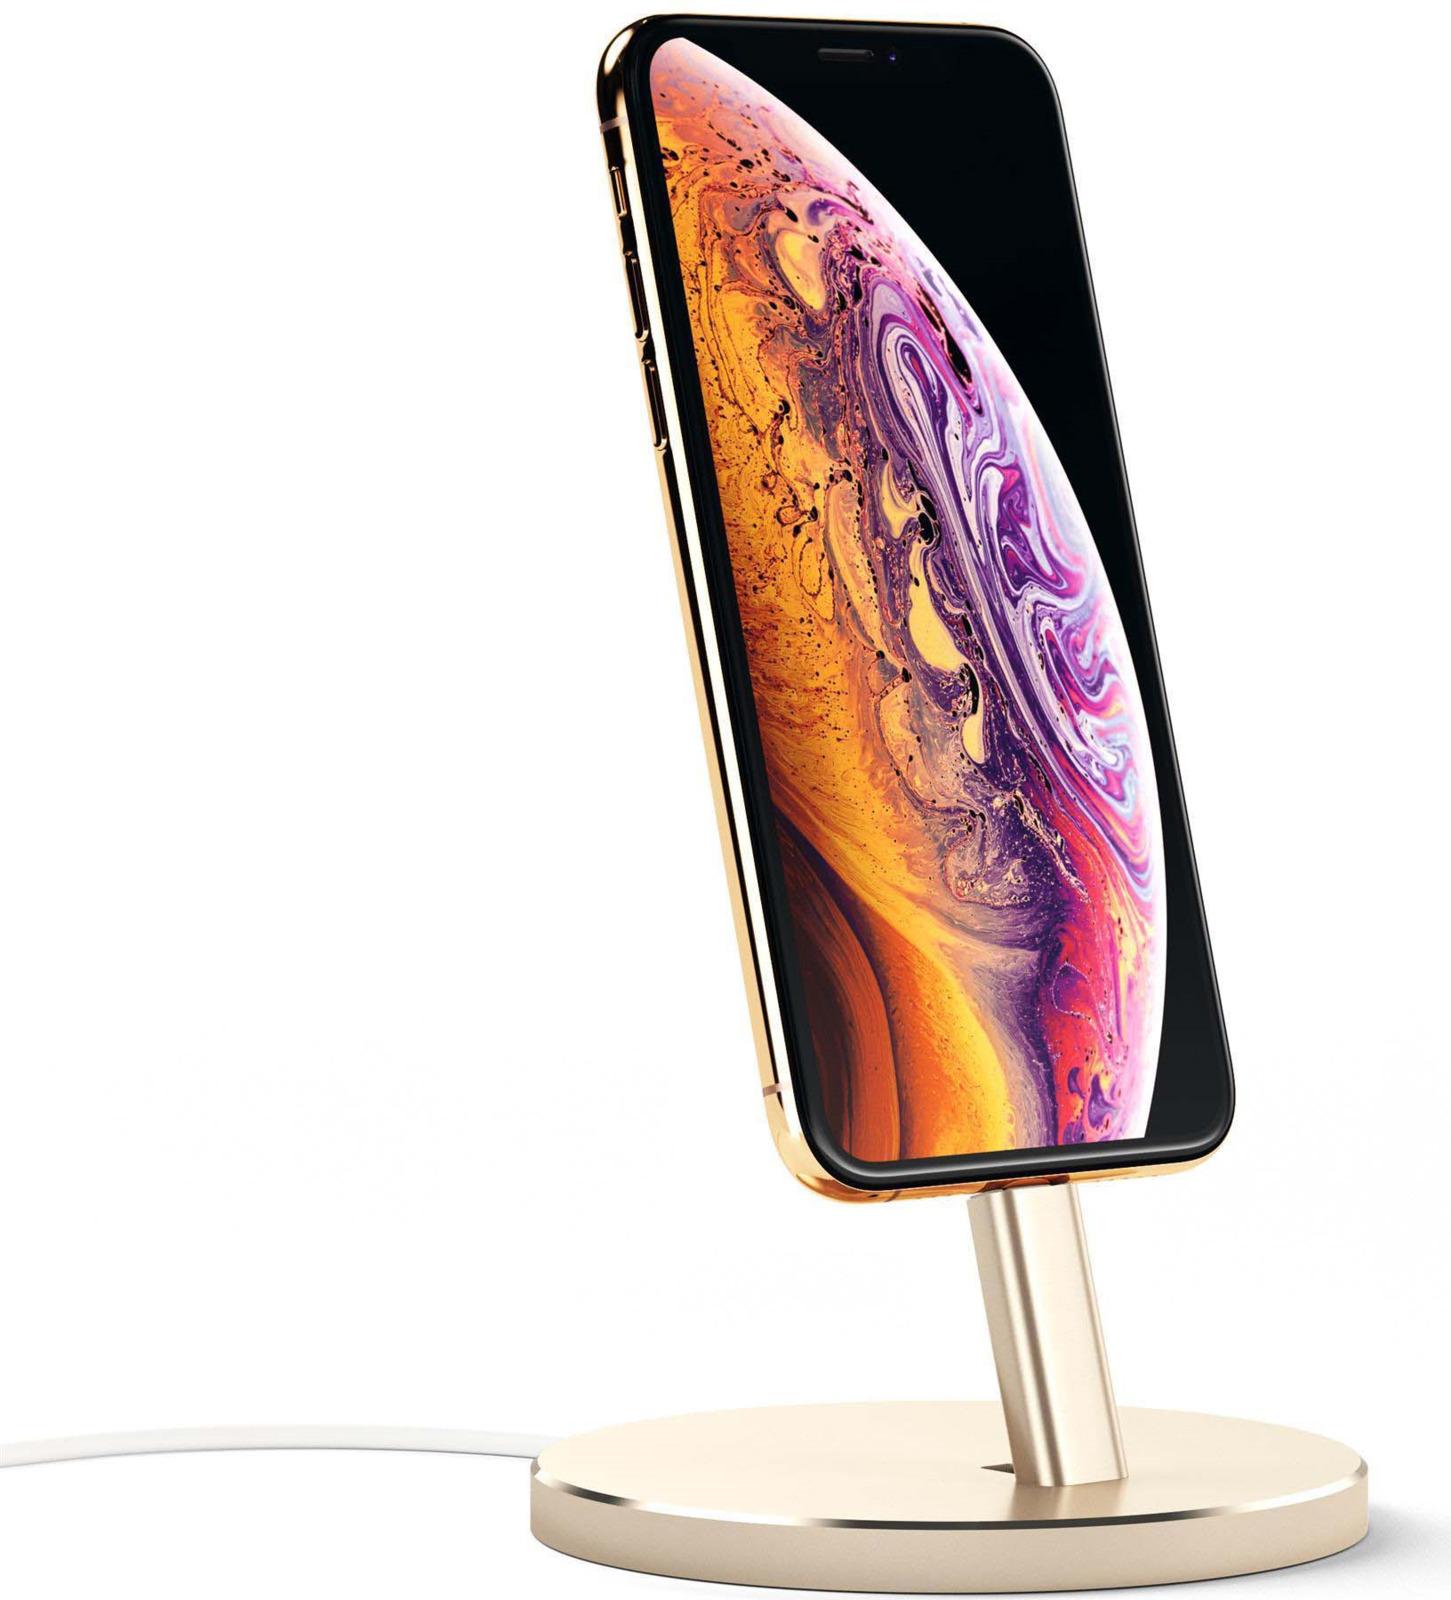 Док-станция Satechi Aluminum Desktop Charging Stand для iPhone с Lightning разъемом, ST-AIPDG, золотой satechi aluminum wireless grey st ahpm